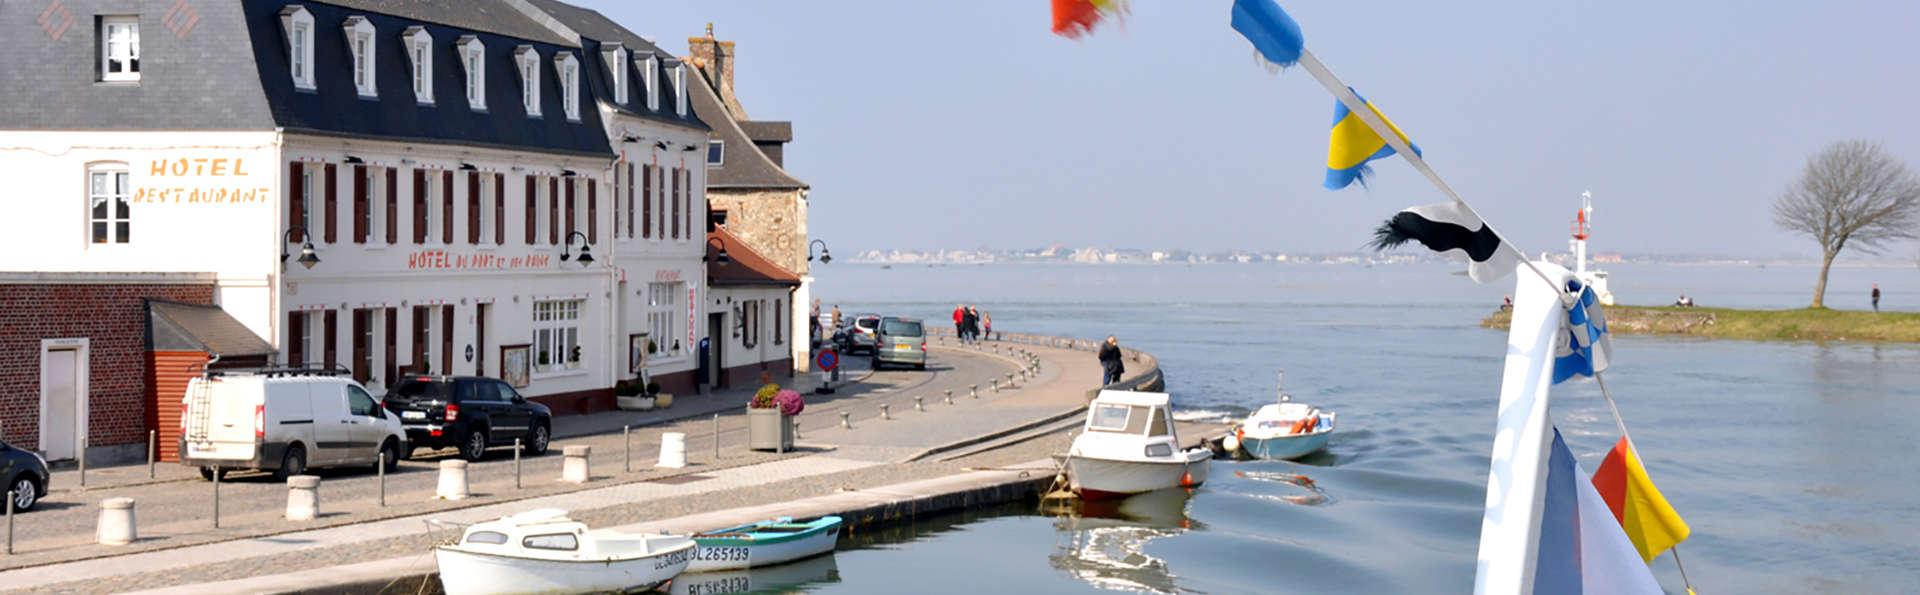 Hôtel du Port et Restaurant des Bains - Edit_Front.jpg